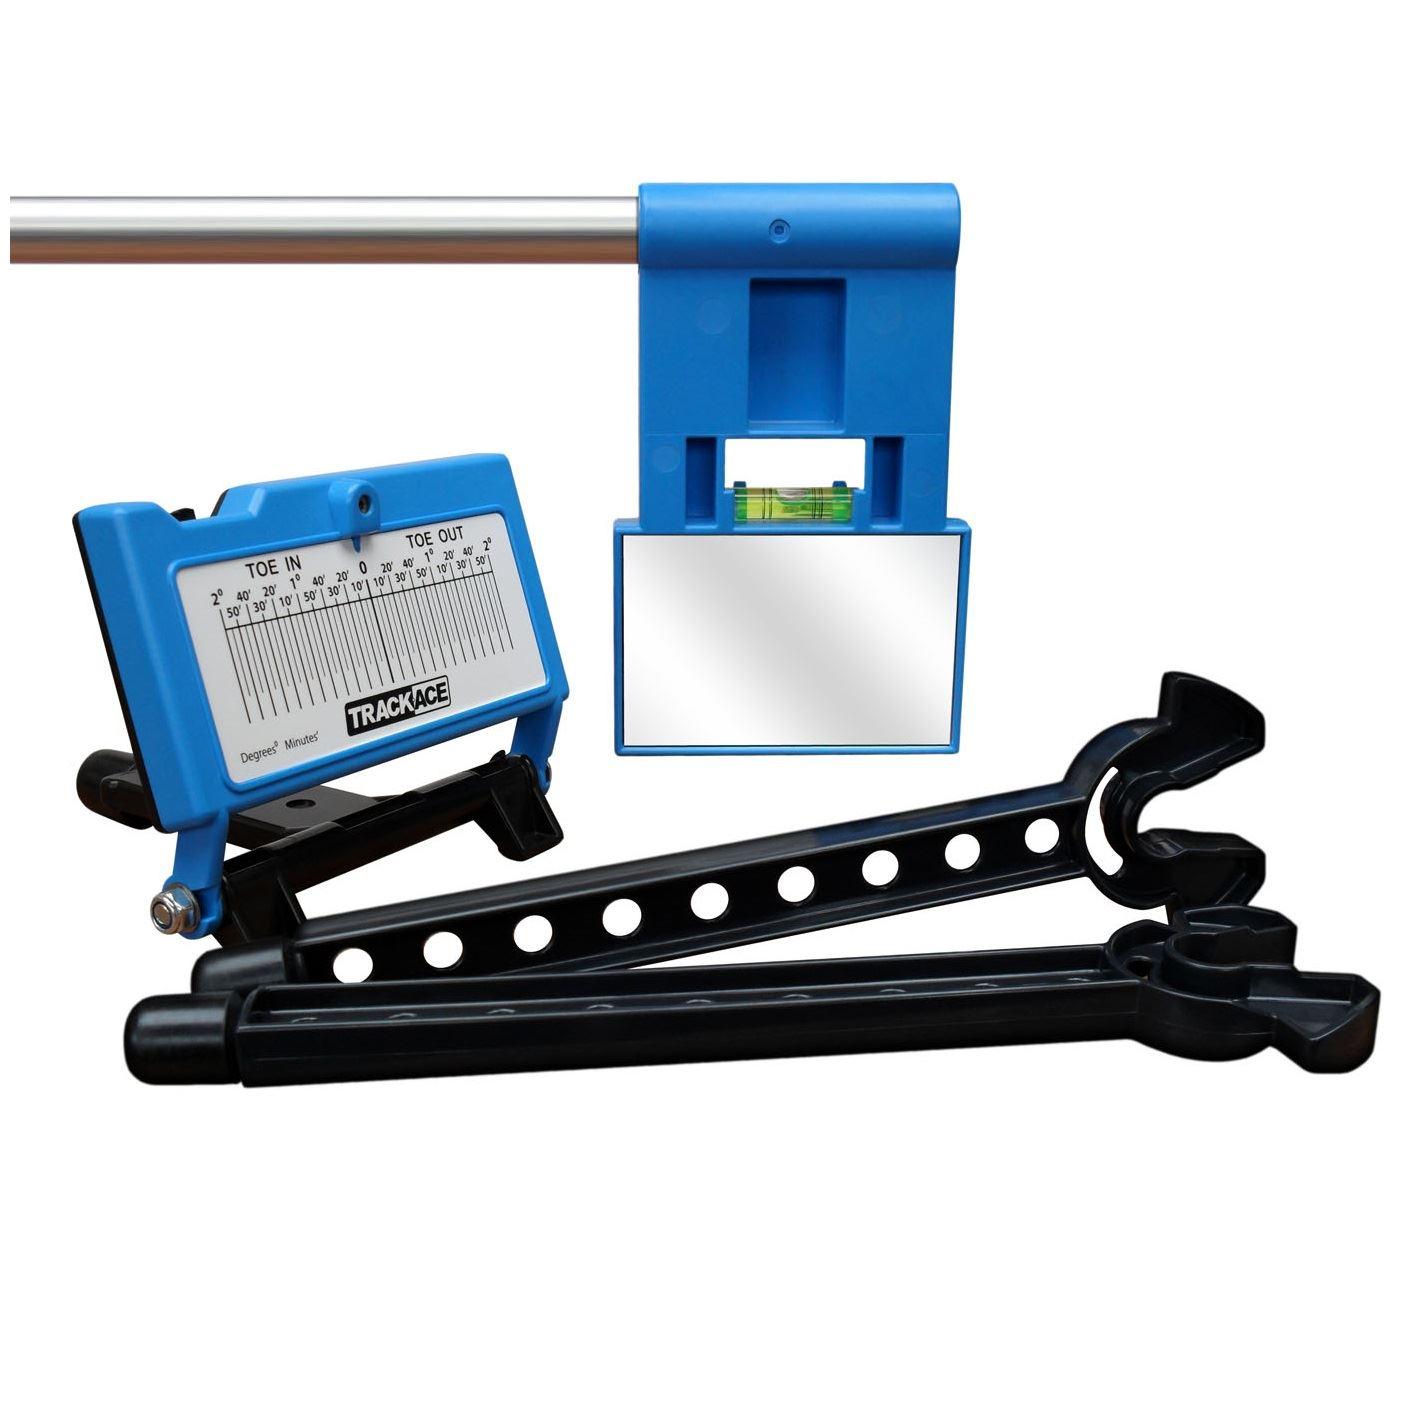 Trackace Laser Wheel Alignment Tracker Tracking Gauges Diy